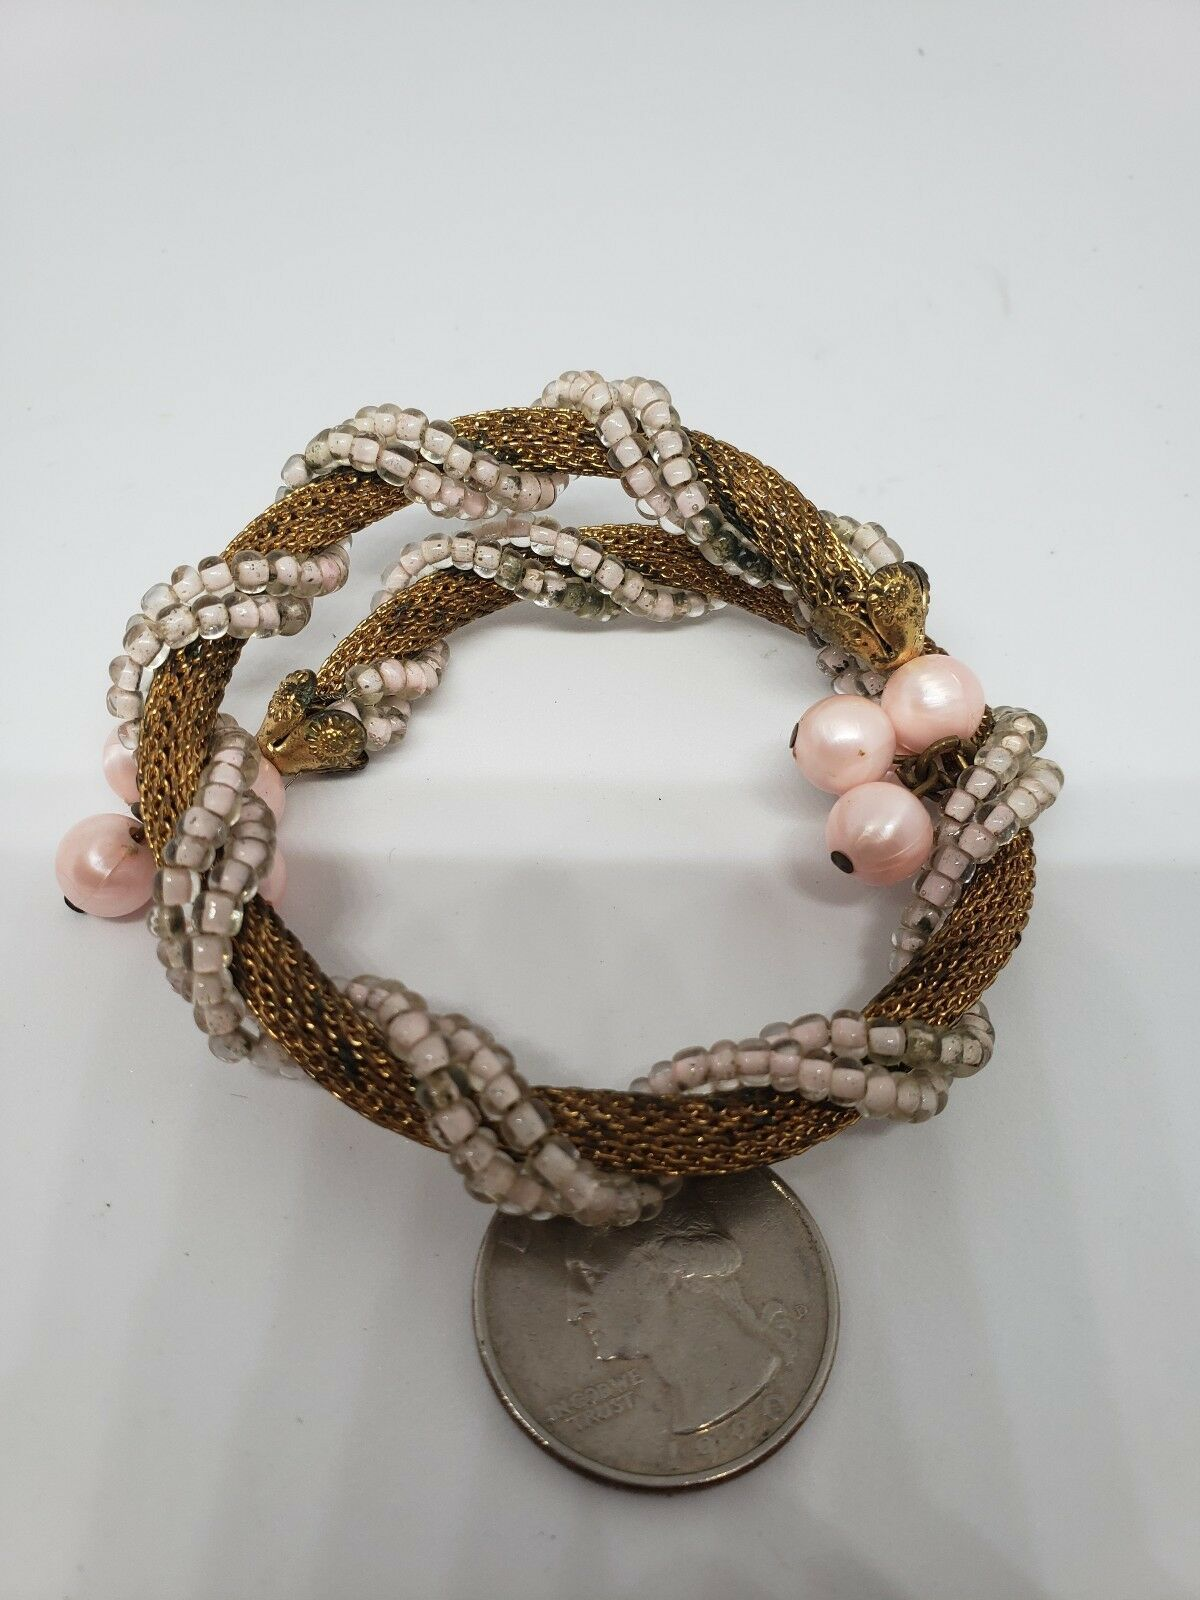 Womens Vintage 1950s Gold Toned Mesh Bracelet/Bangel Pink Cotton Beads